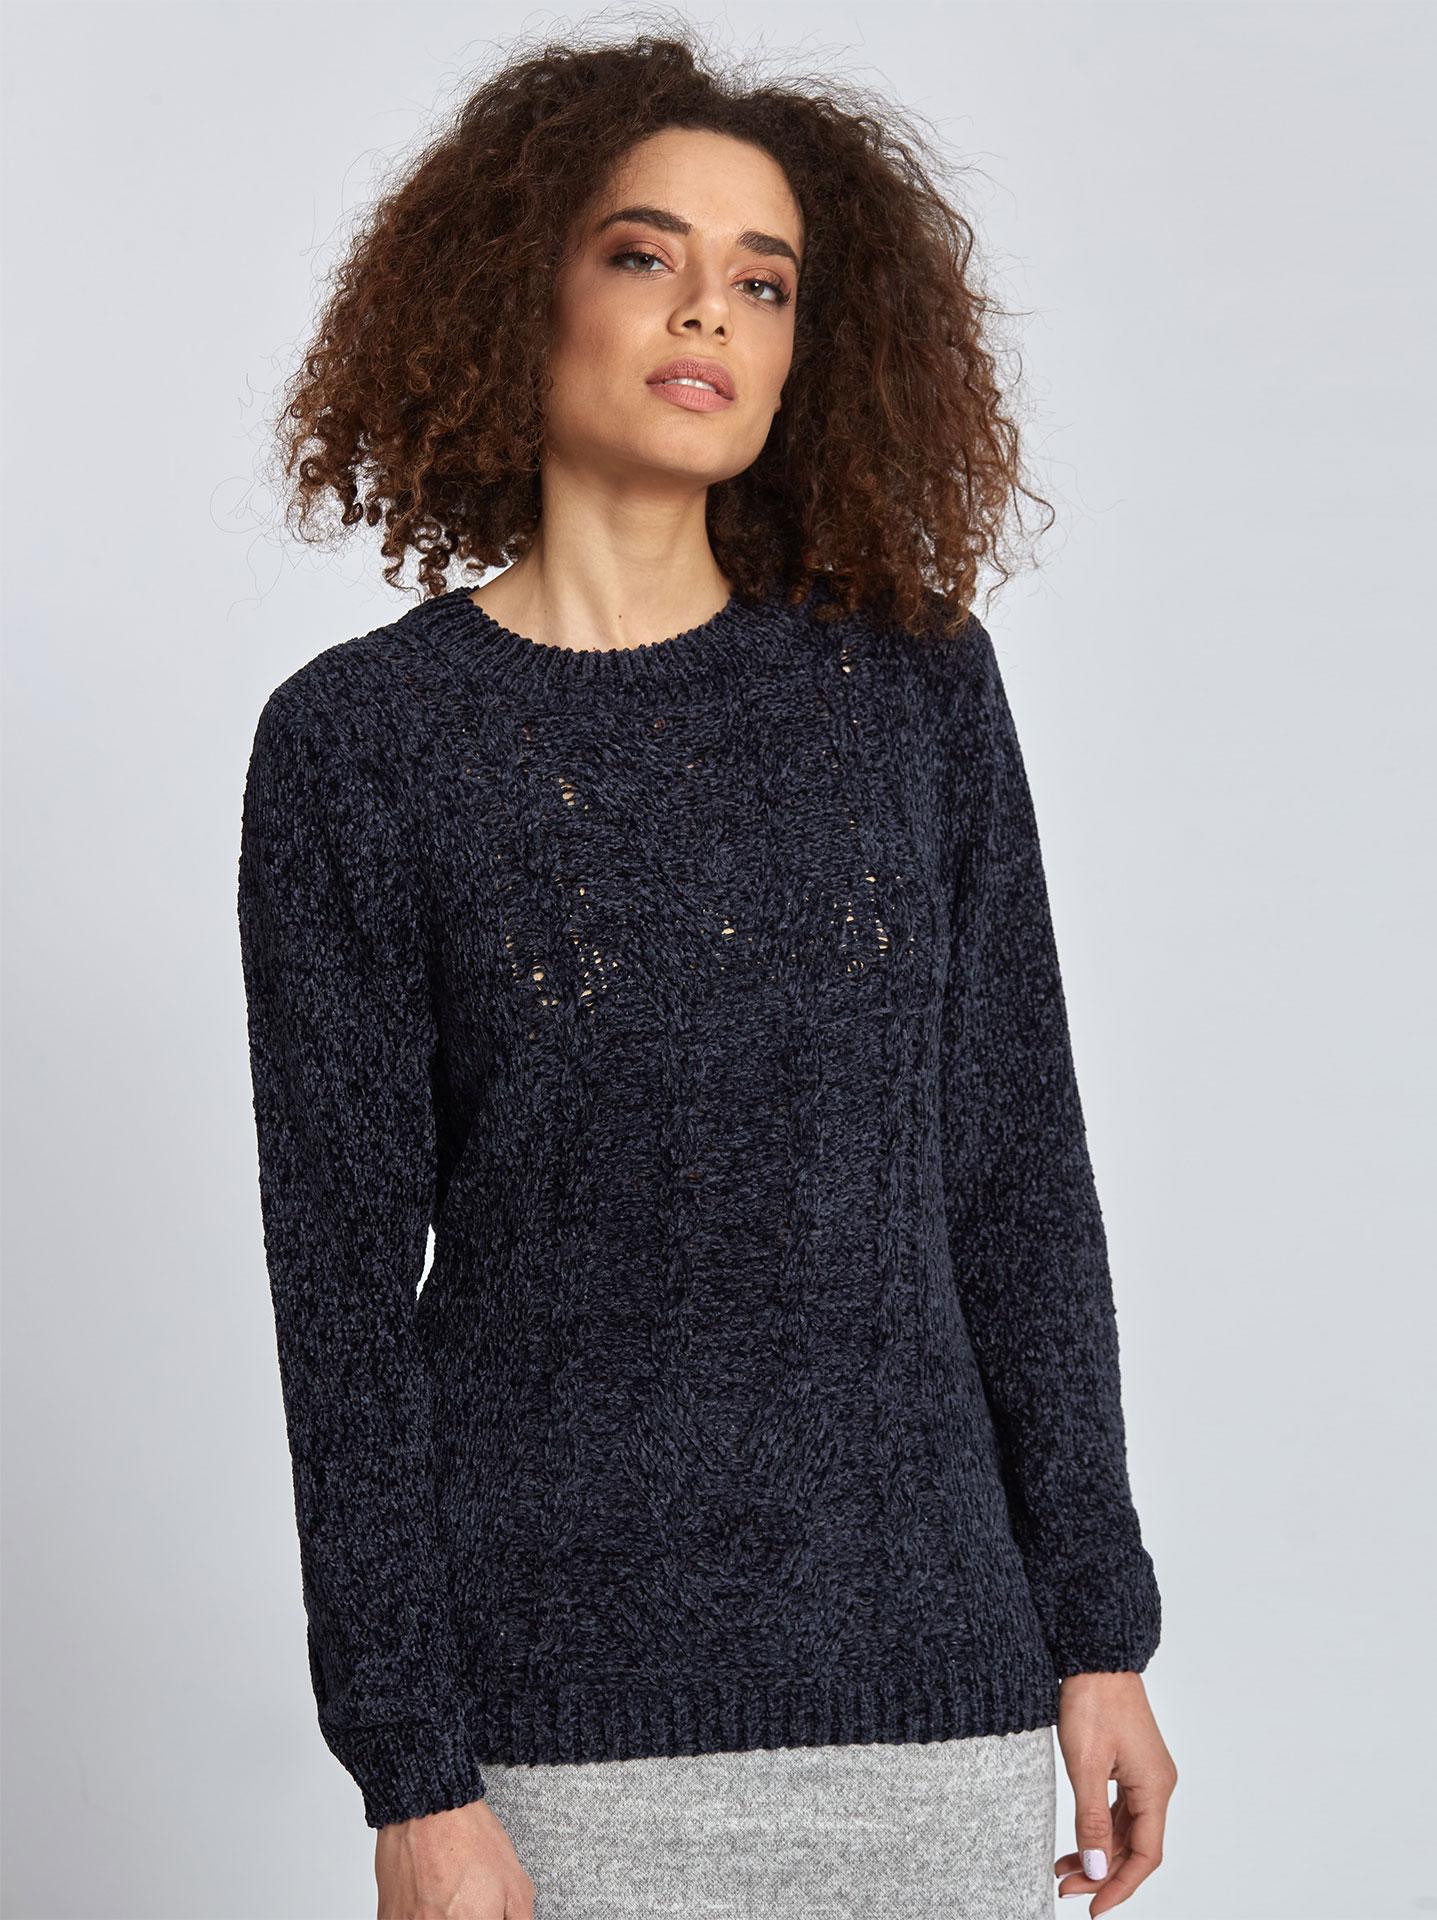 9db2969b618b Chenille πουλόβερ με σχέδιο σε σκουρο μπλε